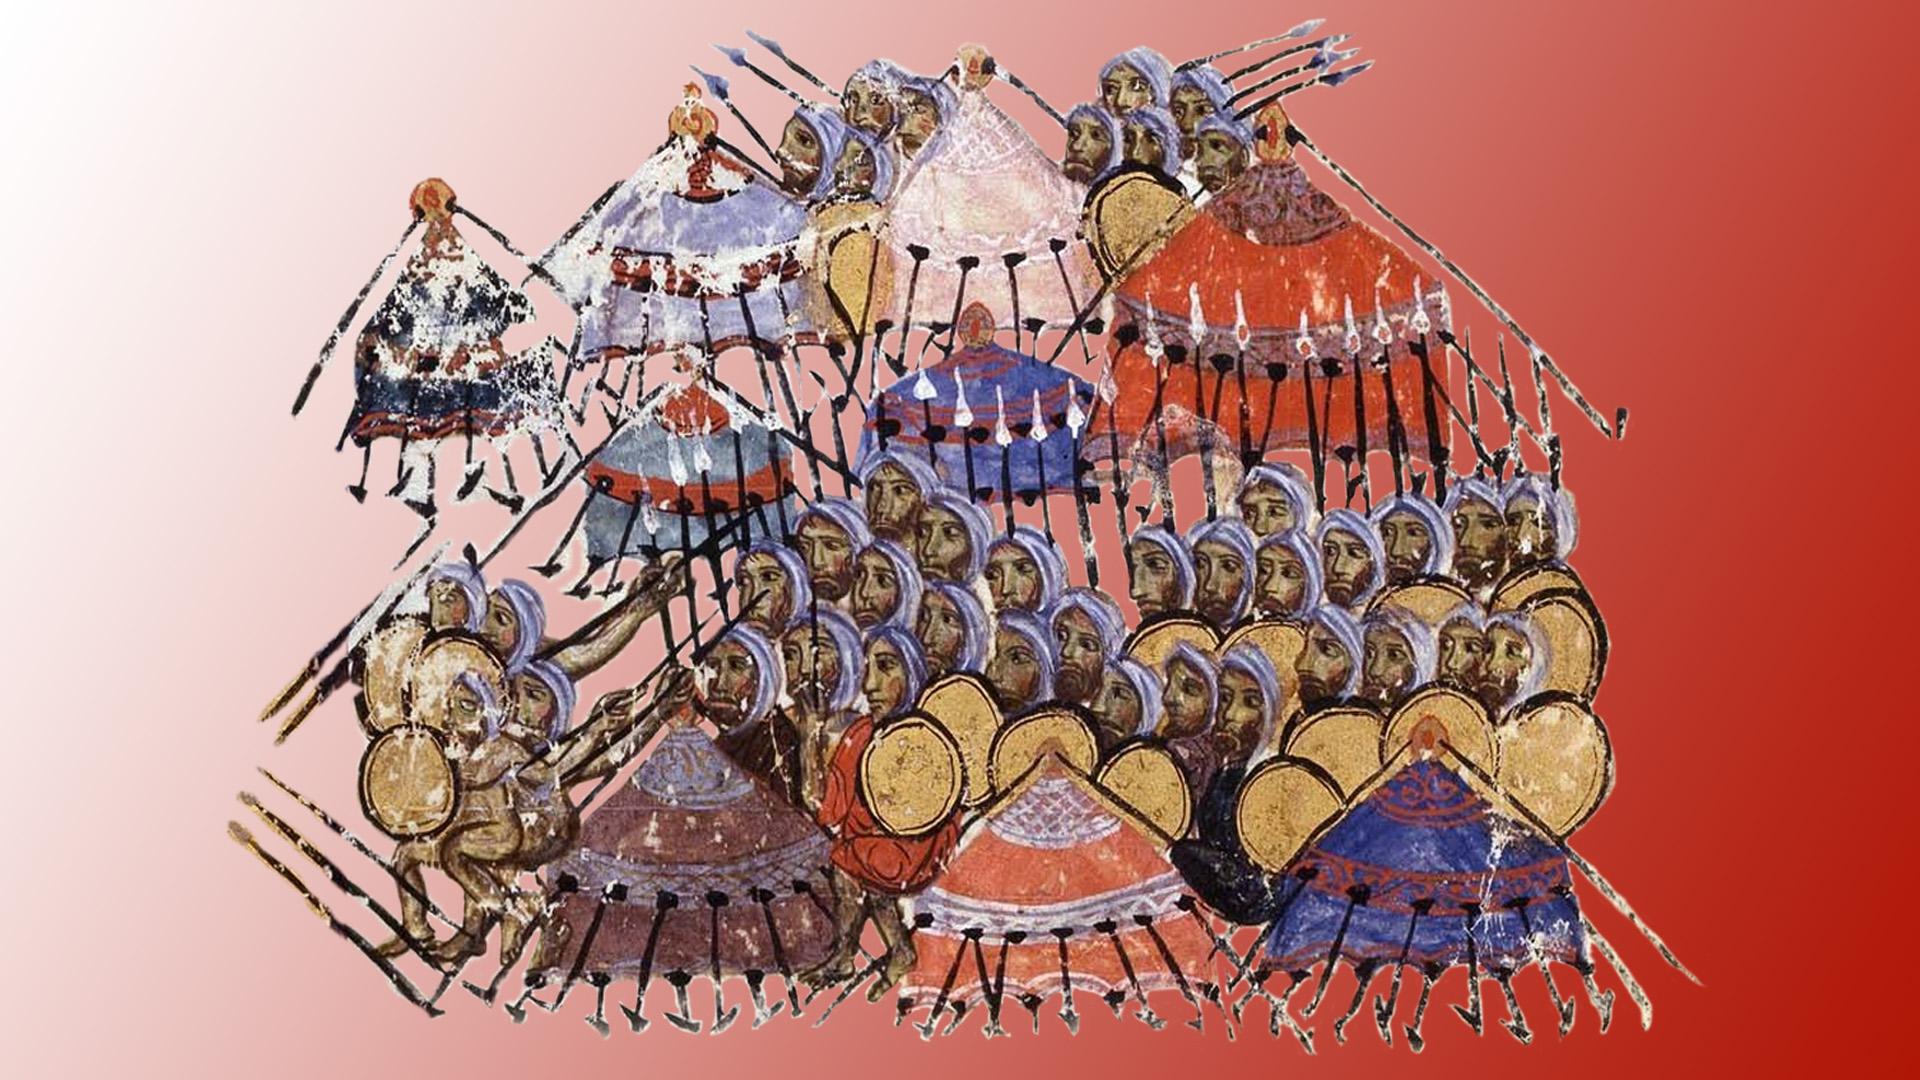 Trentottesima puntata. I bizantini, difensori d'Europa